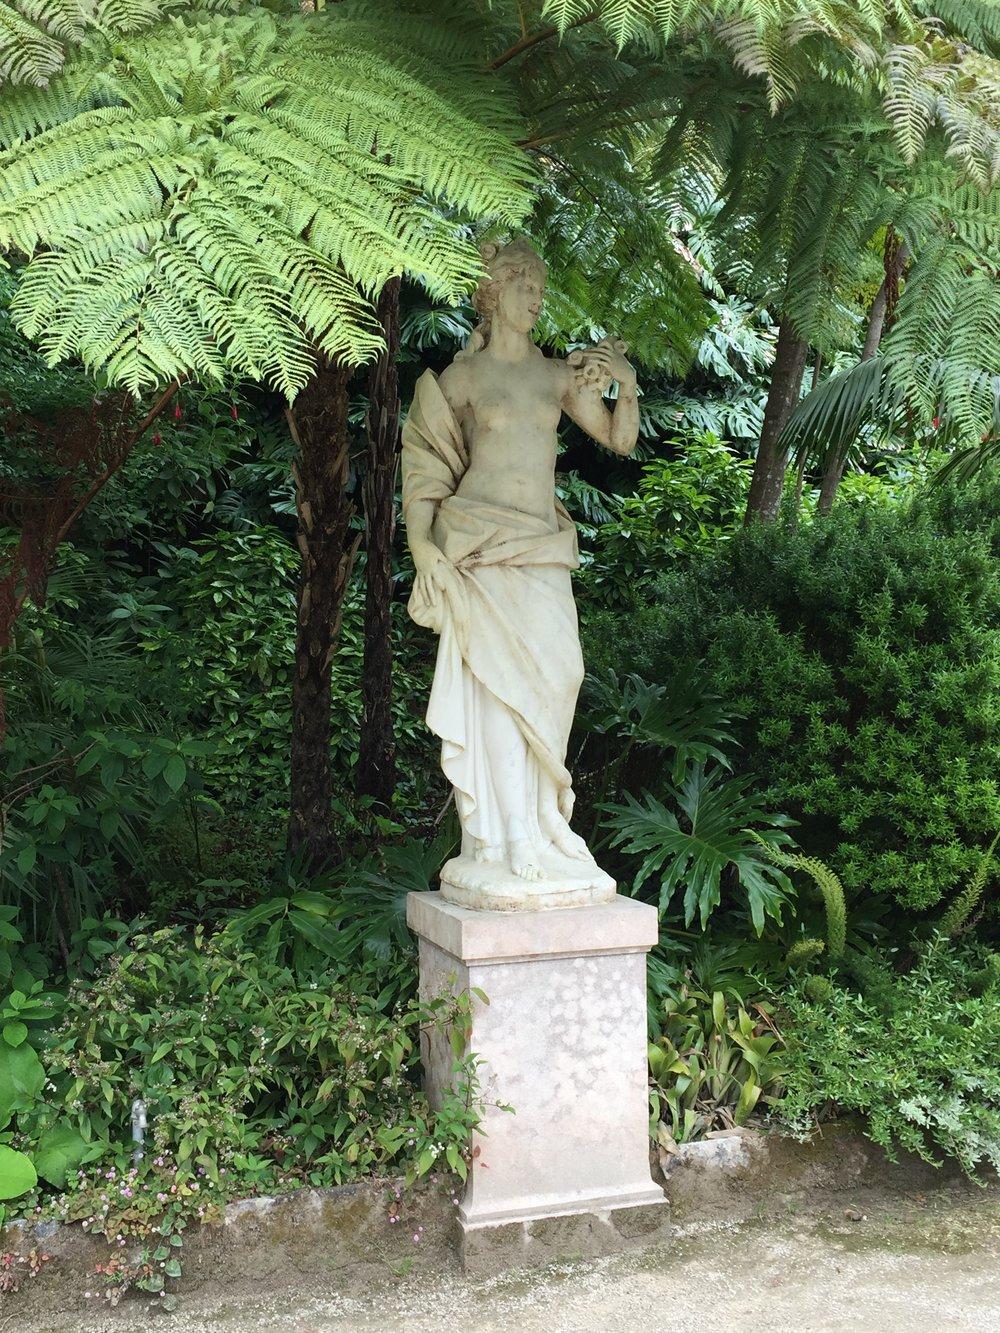 Vênus oferece a chave do amor